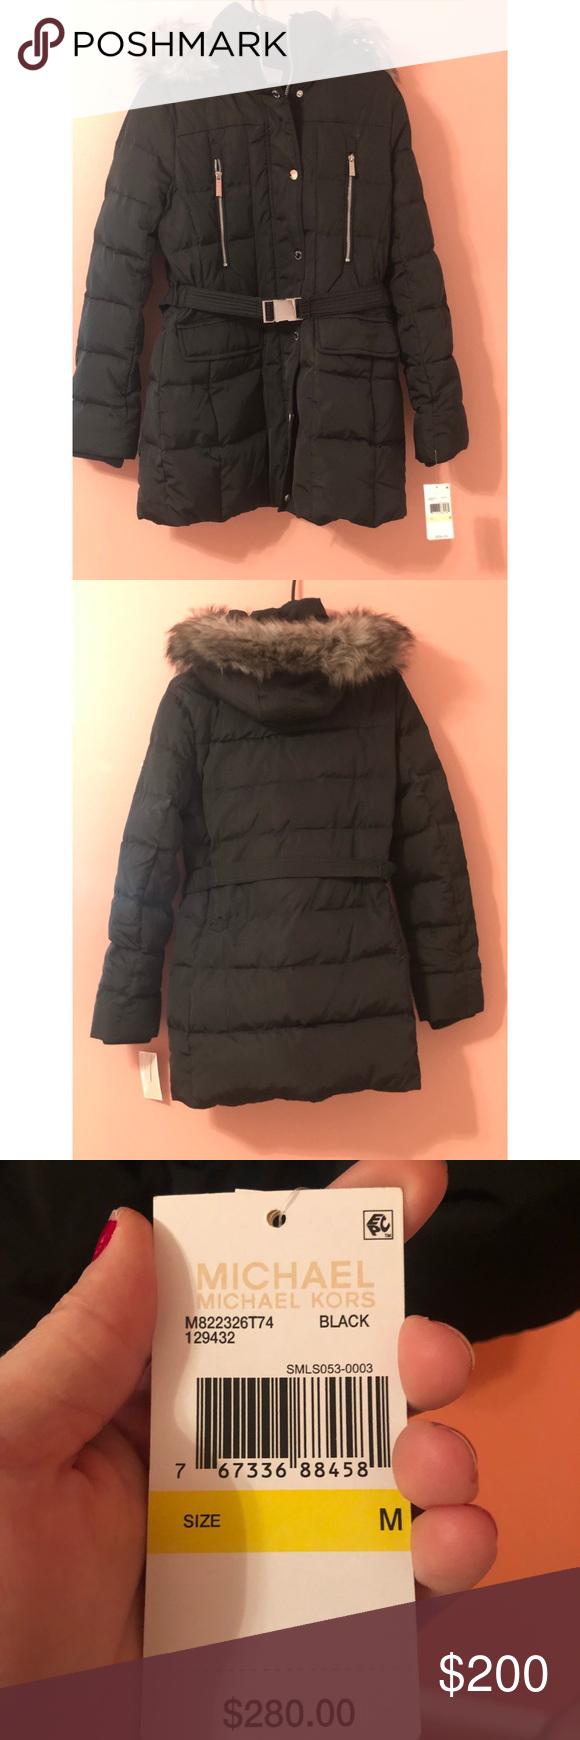 025c9ff43 Michael Kors Winter Down (Puffer) Jacket Brave the winter elements ...